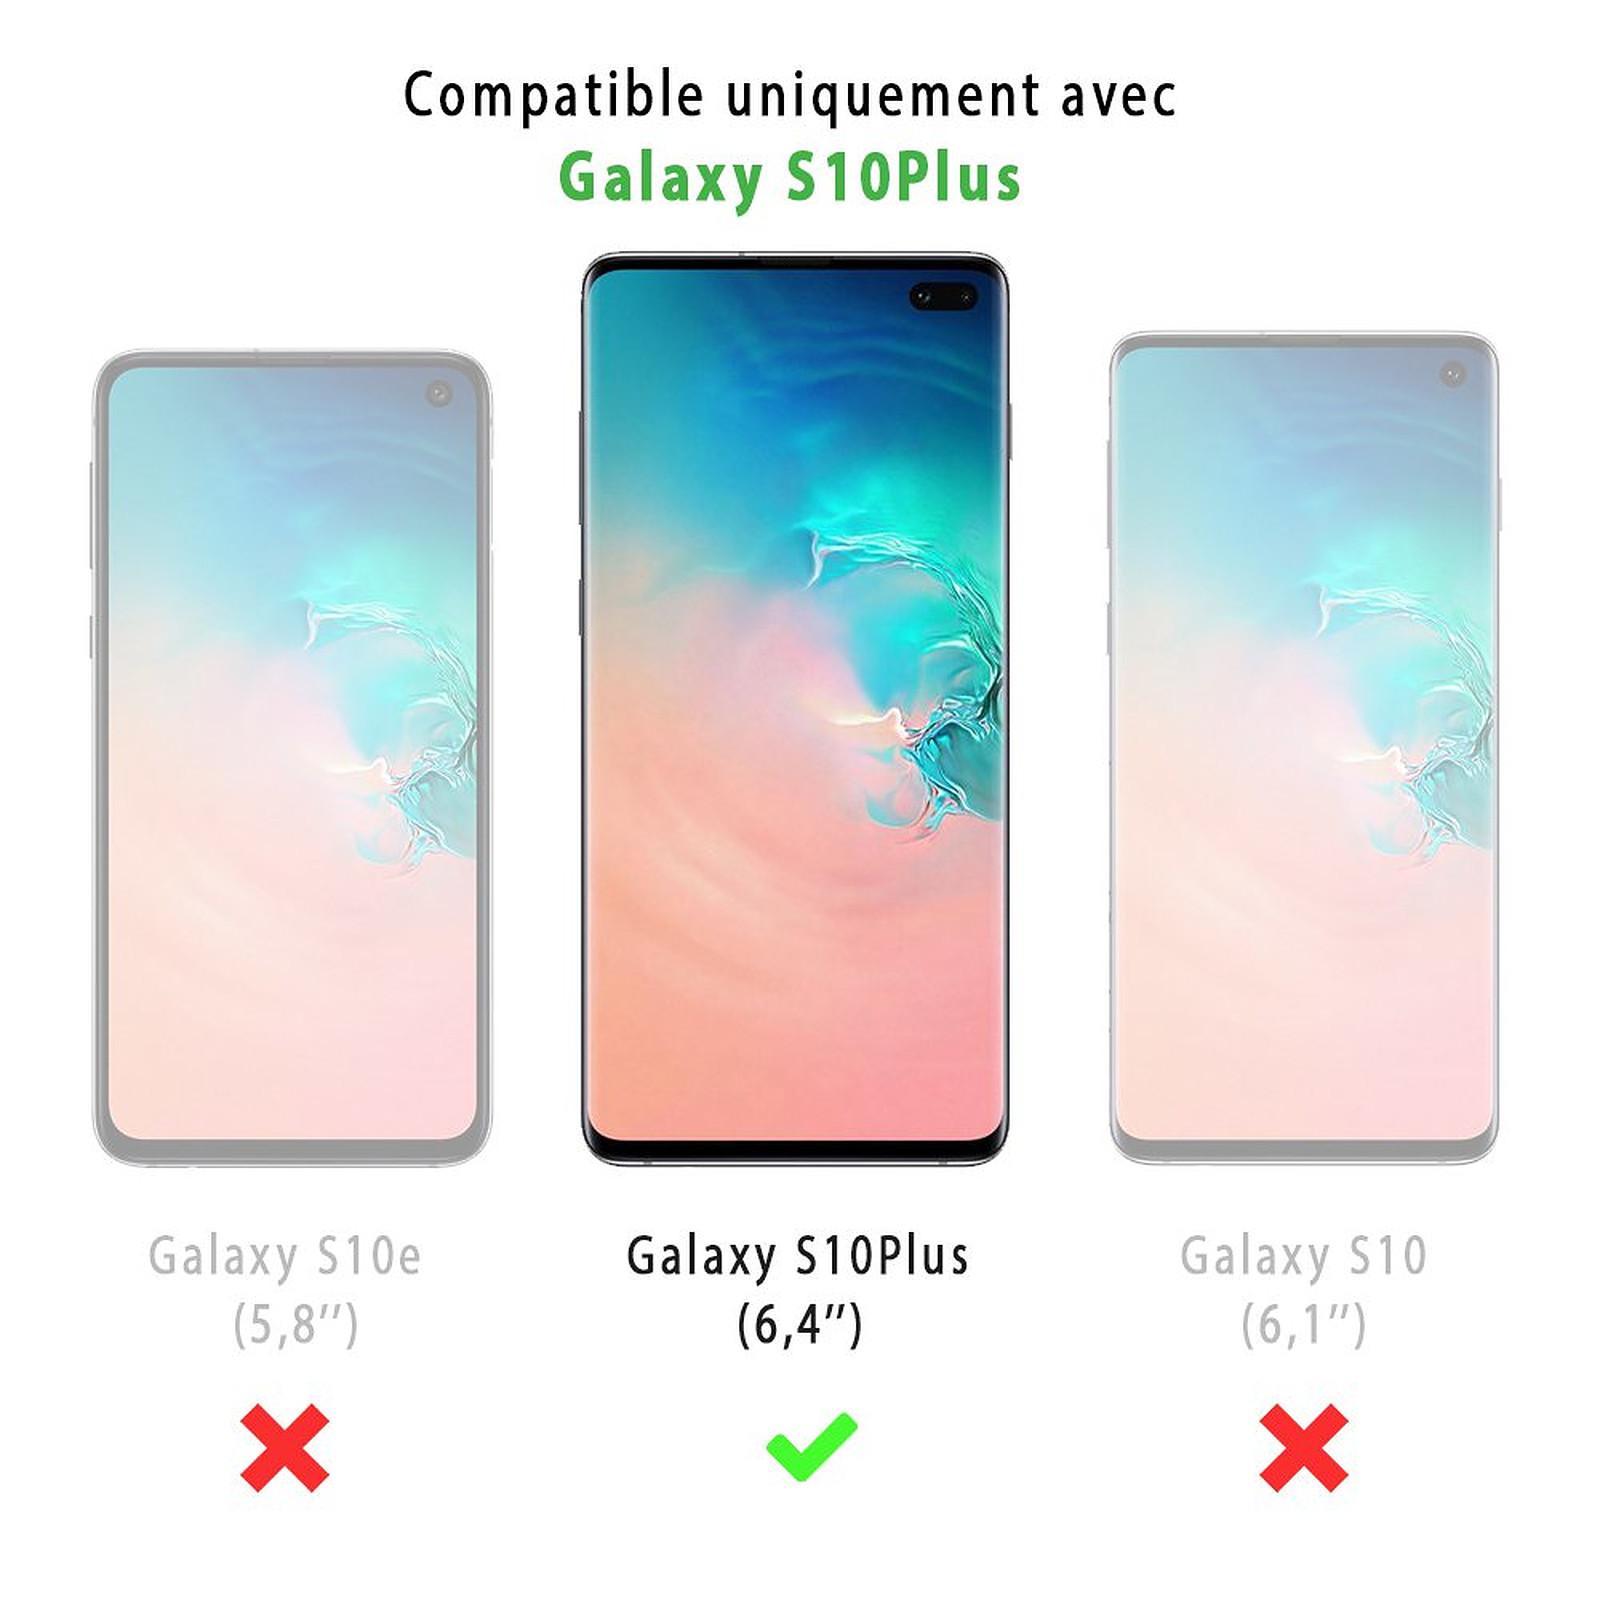 EVETANE Coque Samsung Galaxy S10 Plus 360 intégrale transparente Loup geometrique Tendance